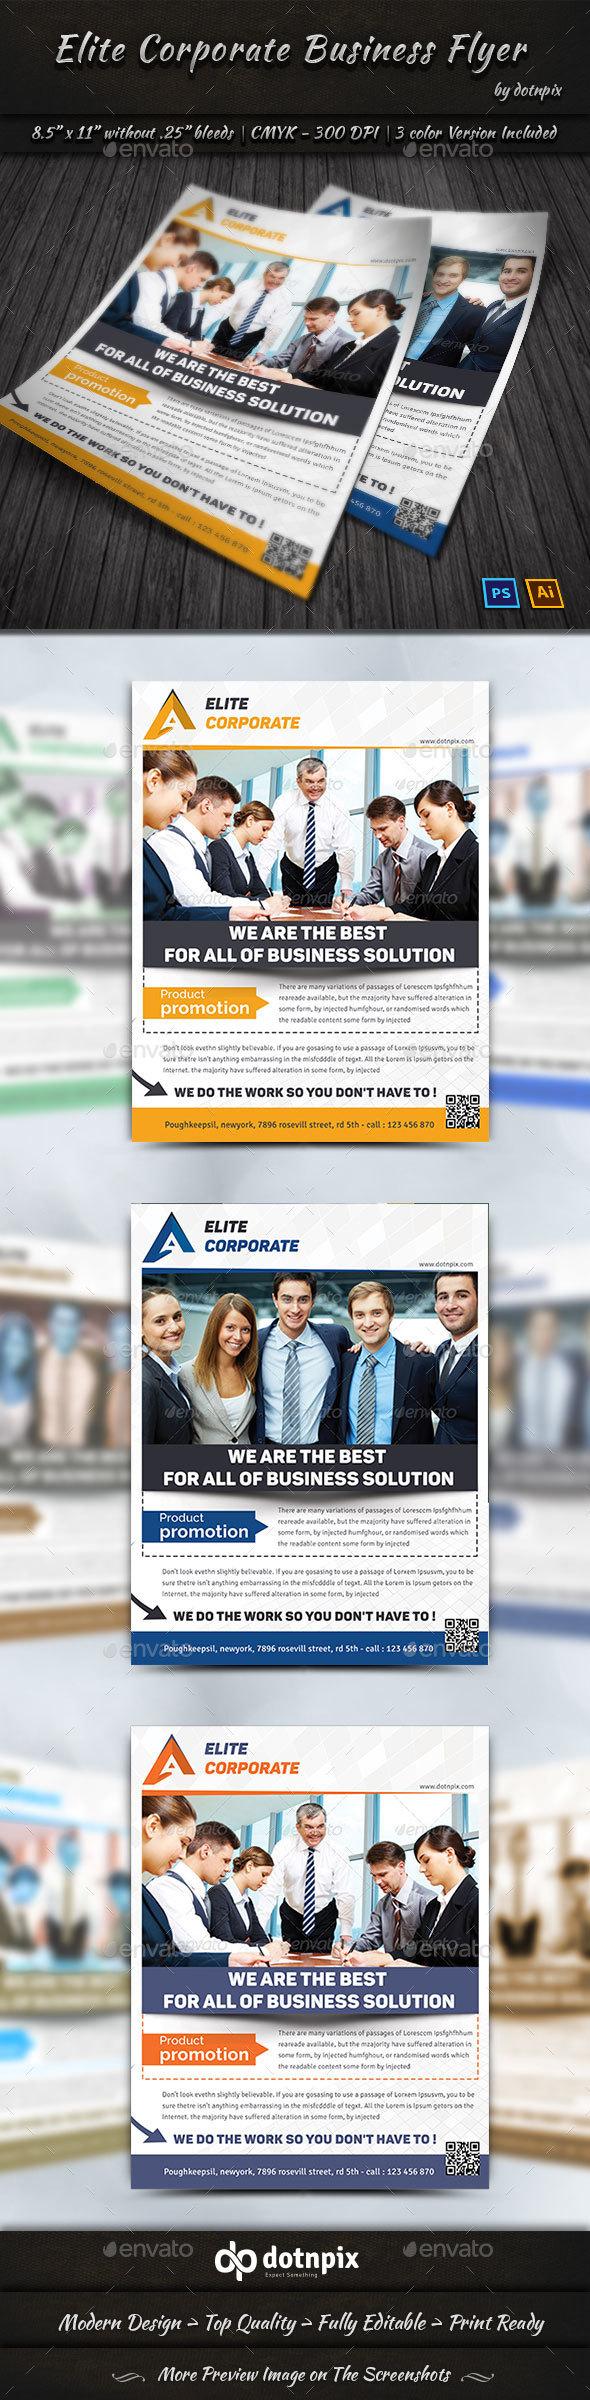 Elite Corporate Business Flyer - Corporate Flyers